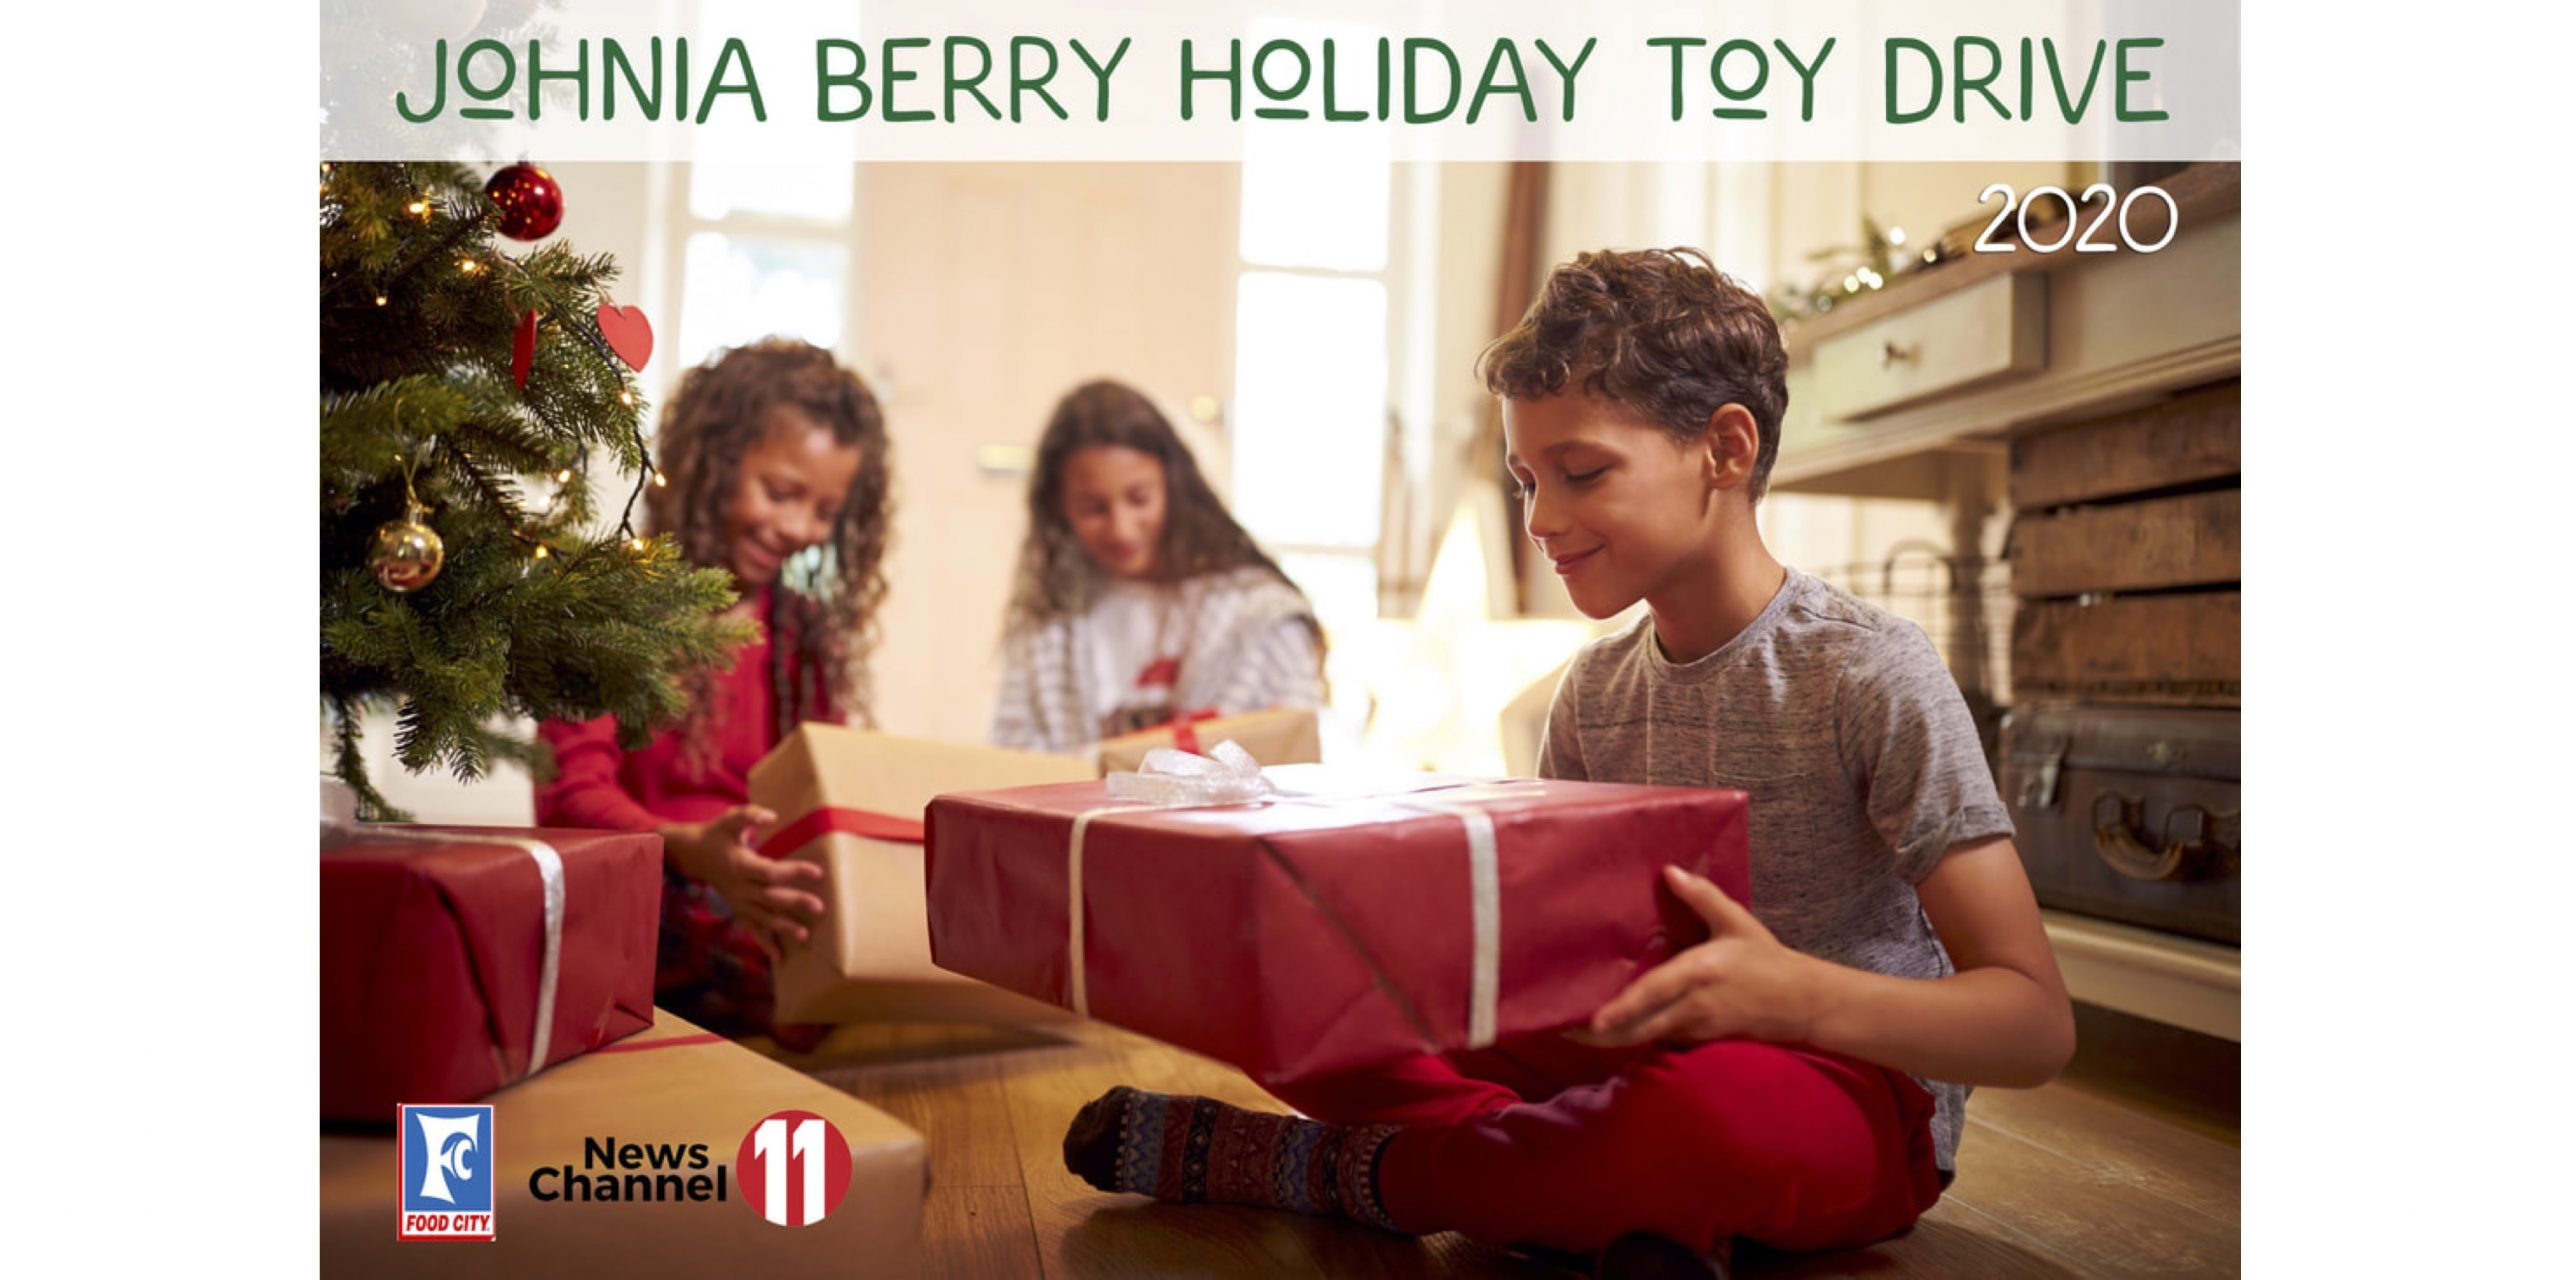 Johnia Berry Virtual Toy Drive 2020